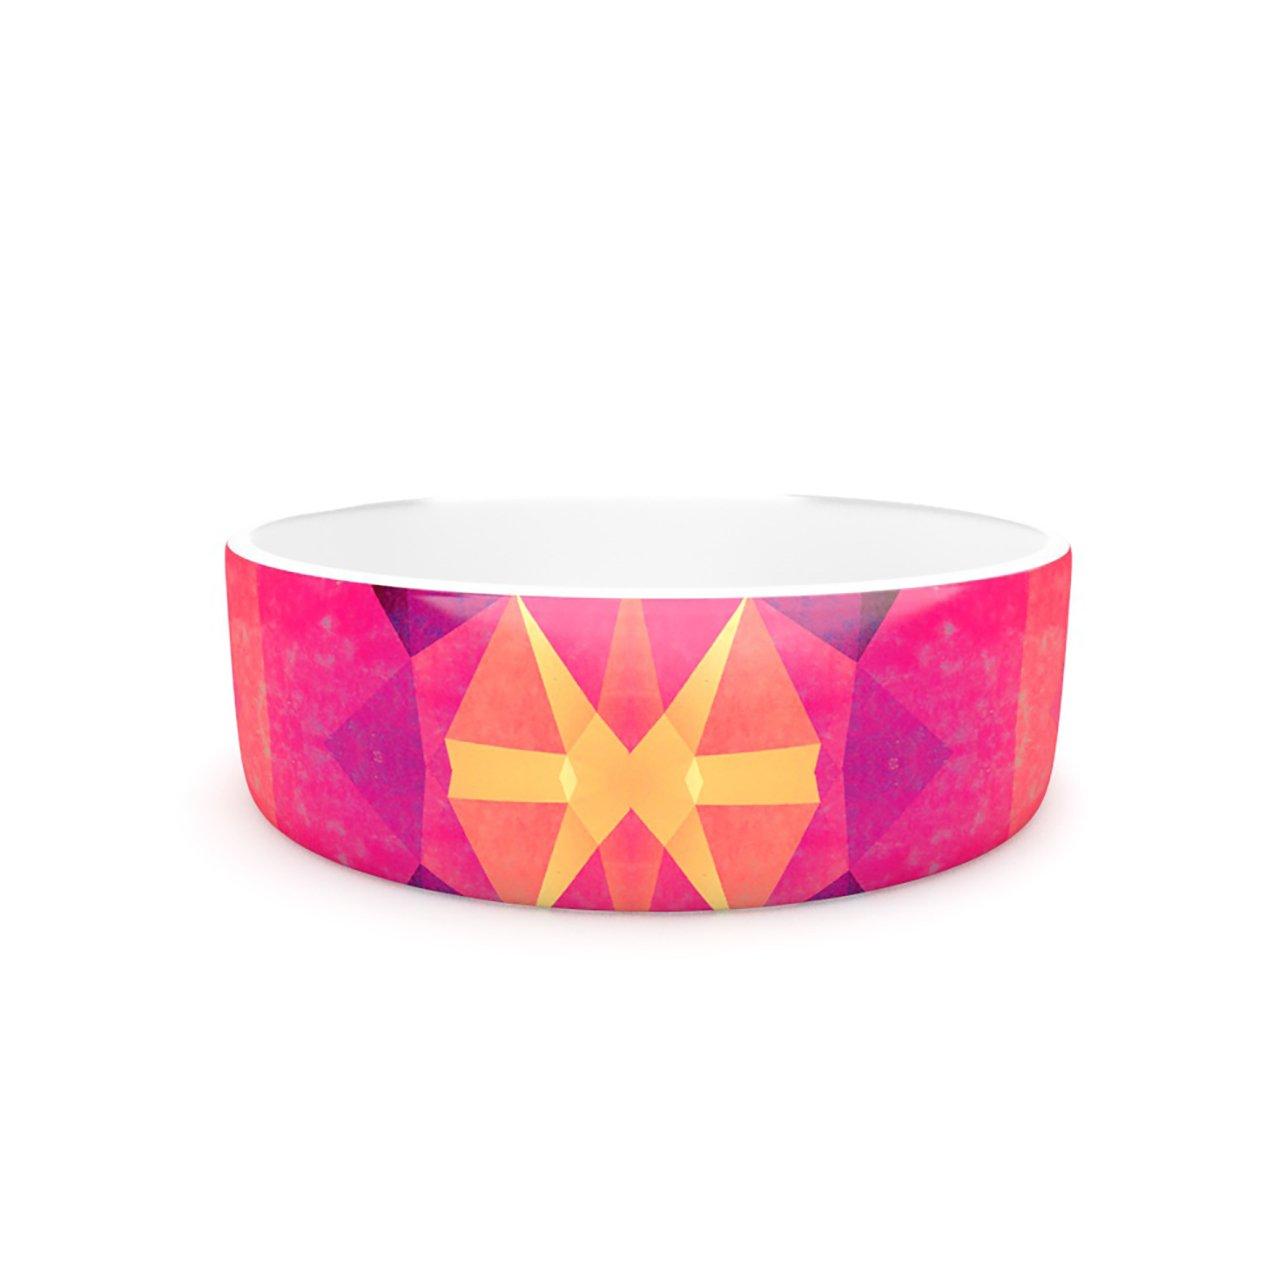 Kess InHouse Nika Martinez Retro Pink Geometrie  Pet Bowl, 7-Inch, Pink Yellow